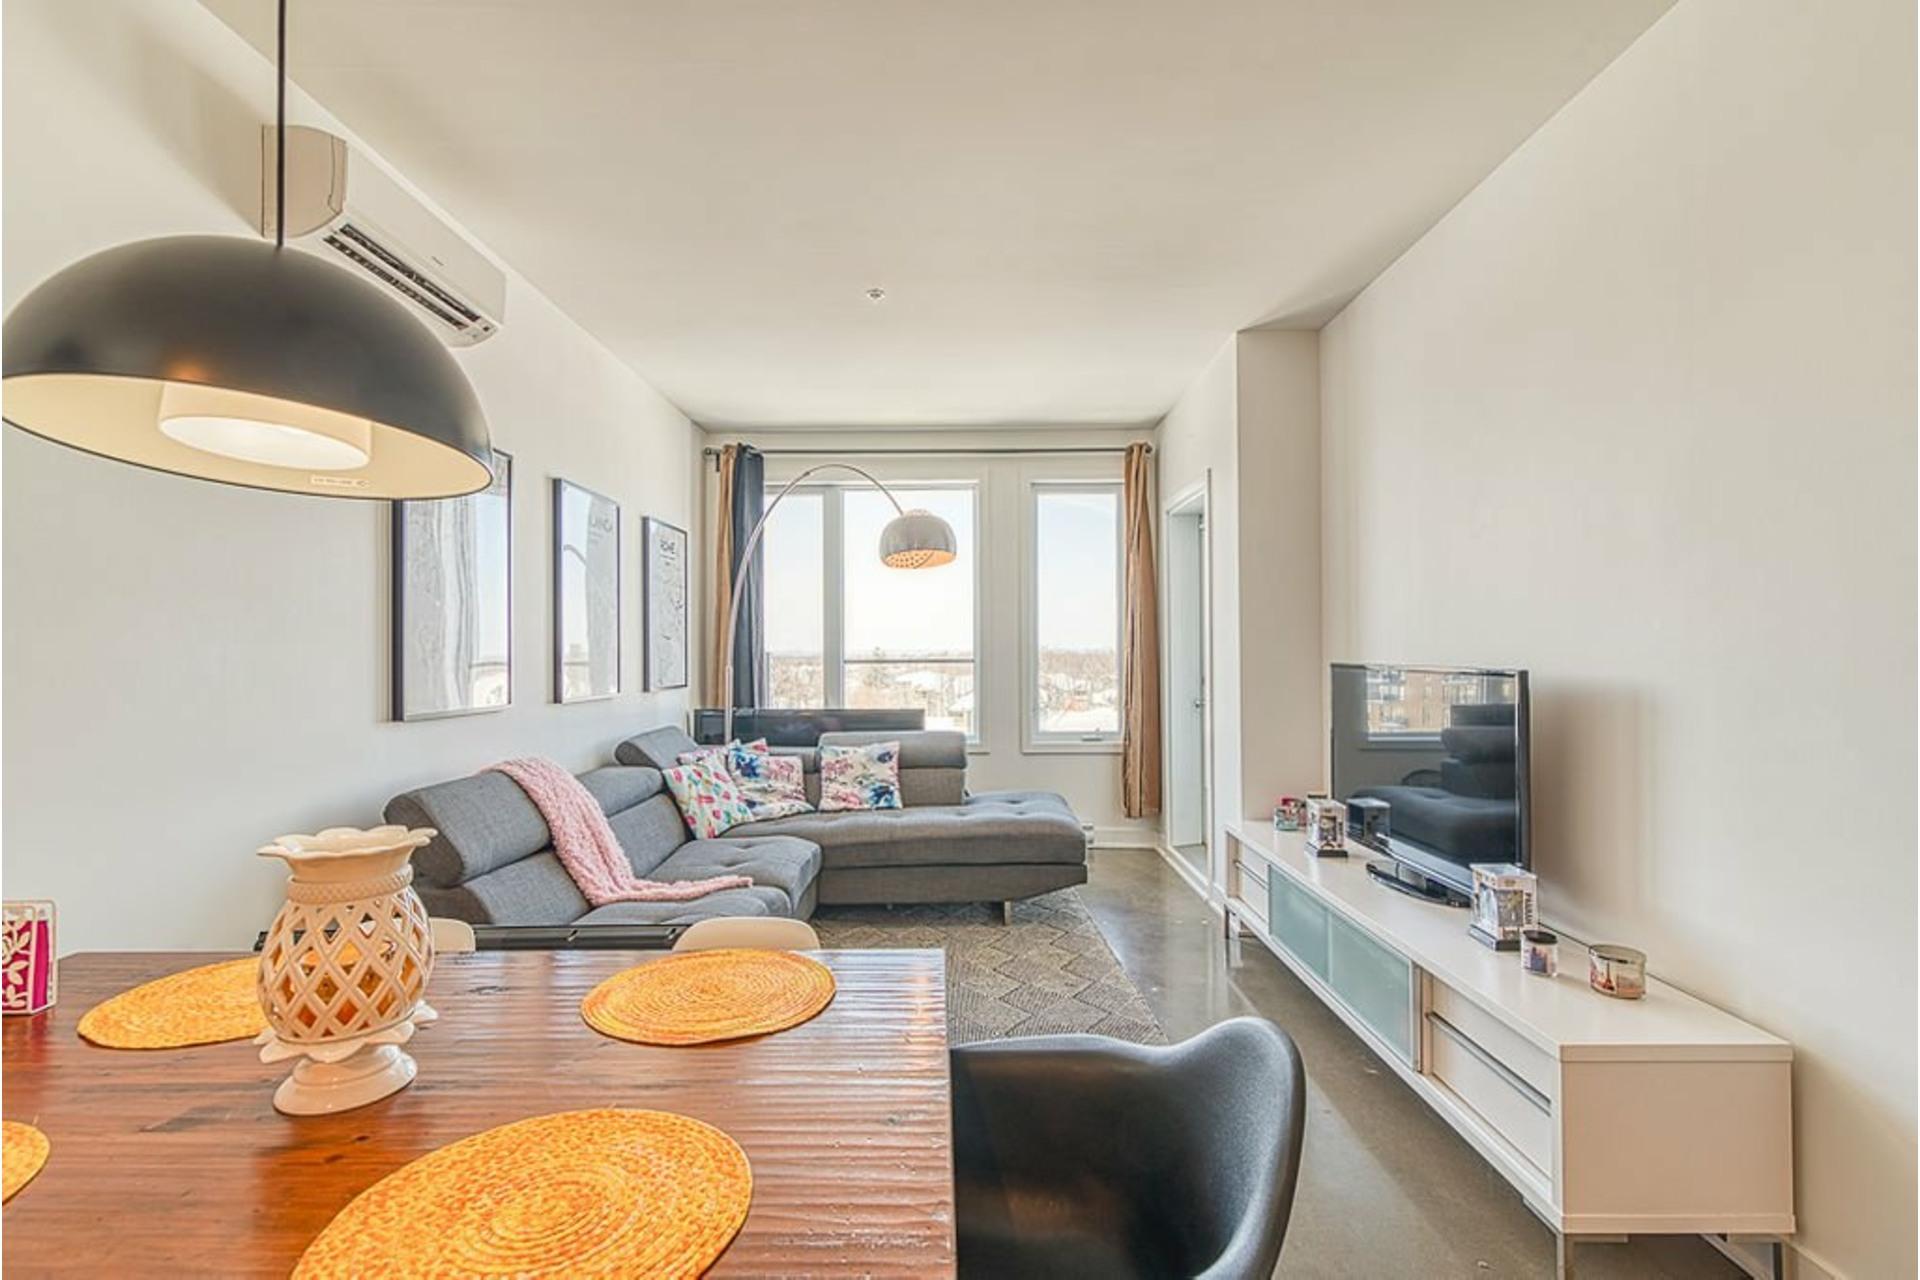 image 7 - Apartment For sale Blainville - 4 rooms